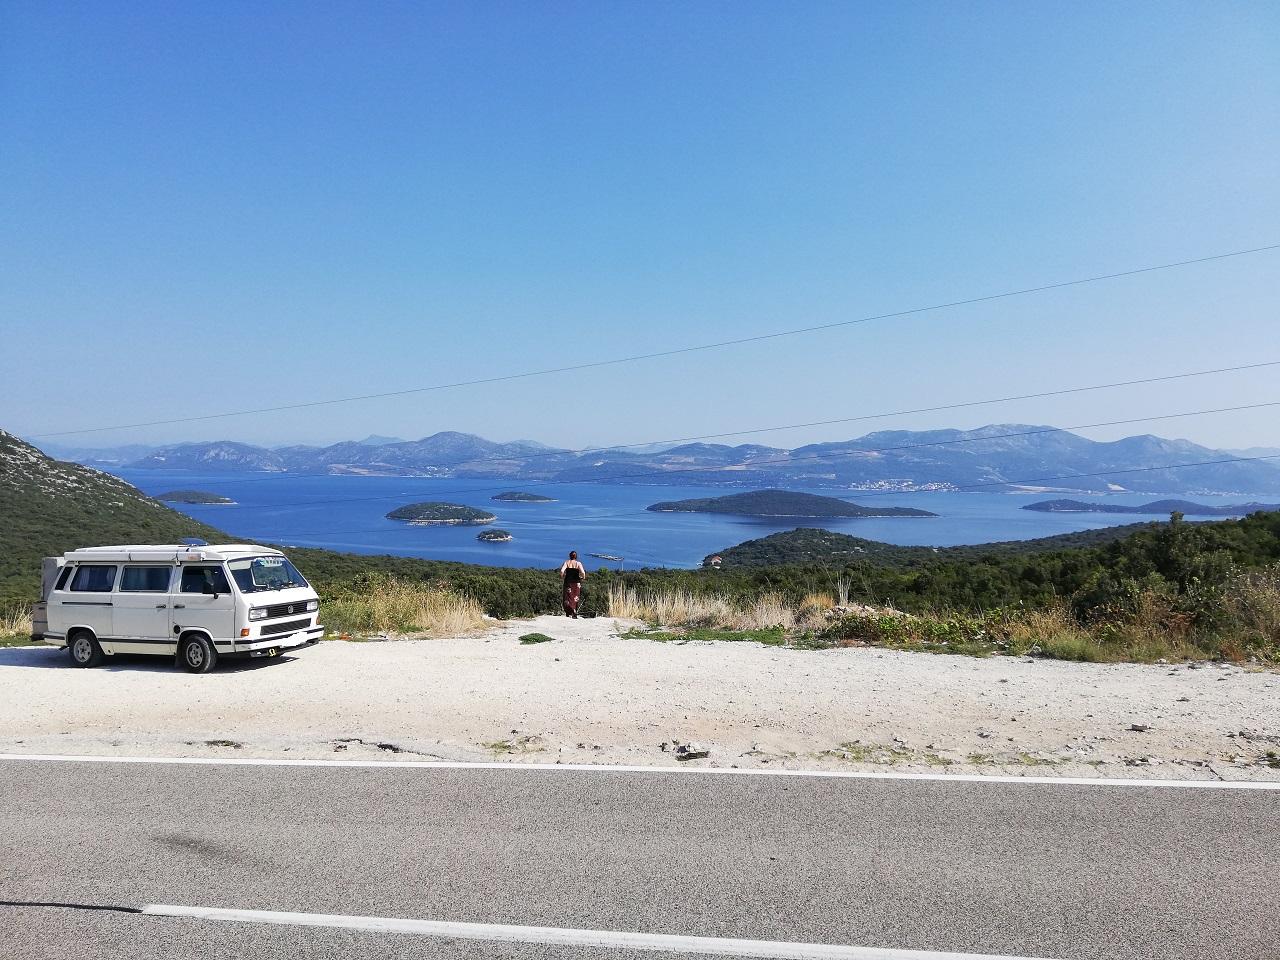 Blick auf die Insel Korcula